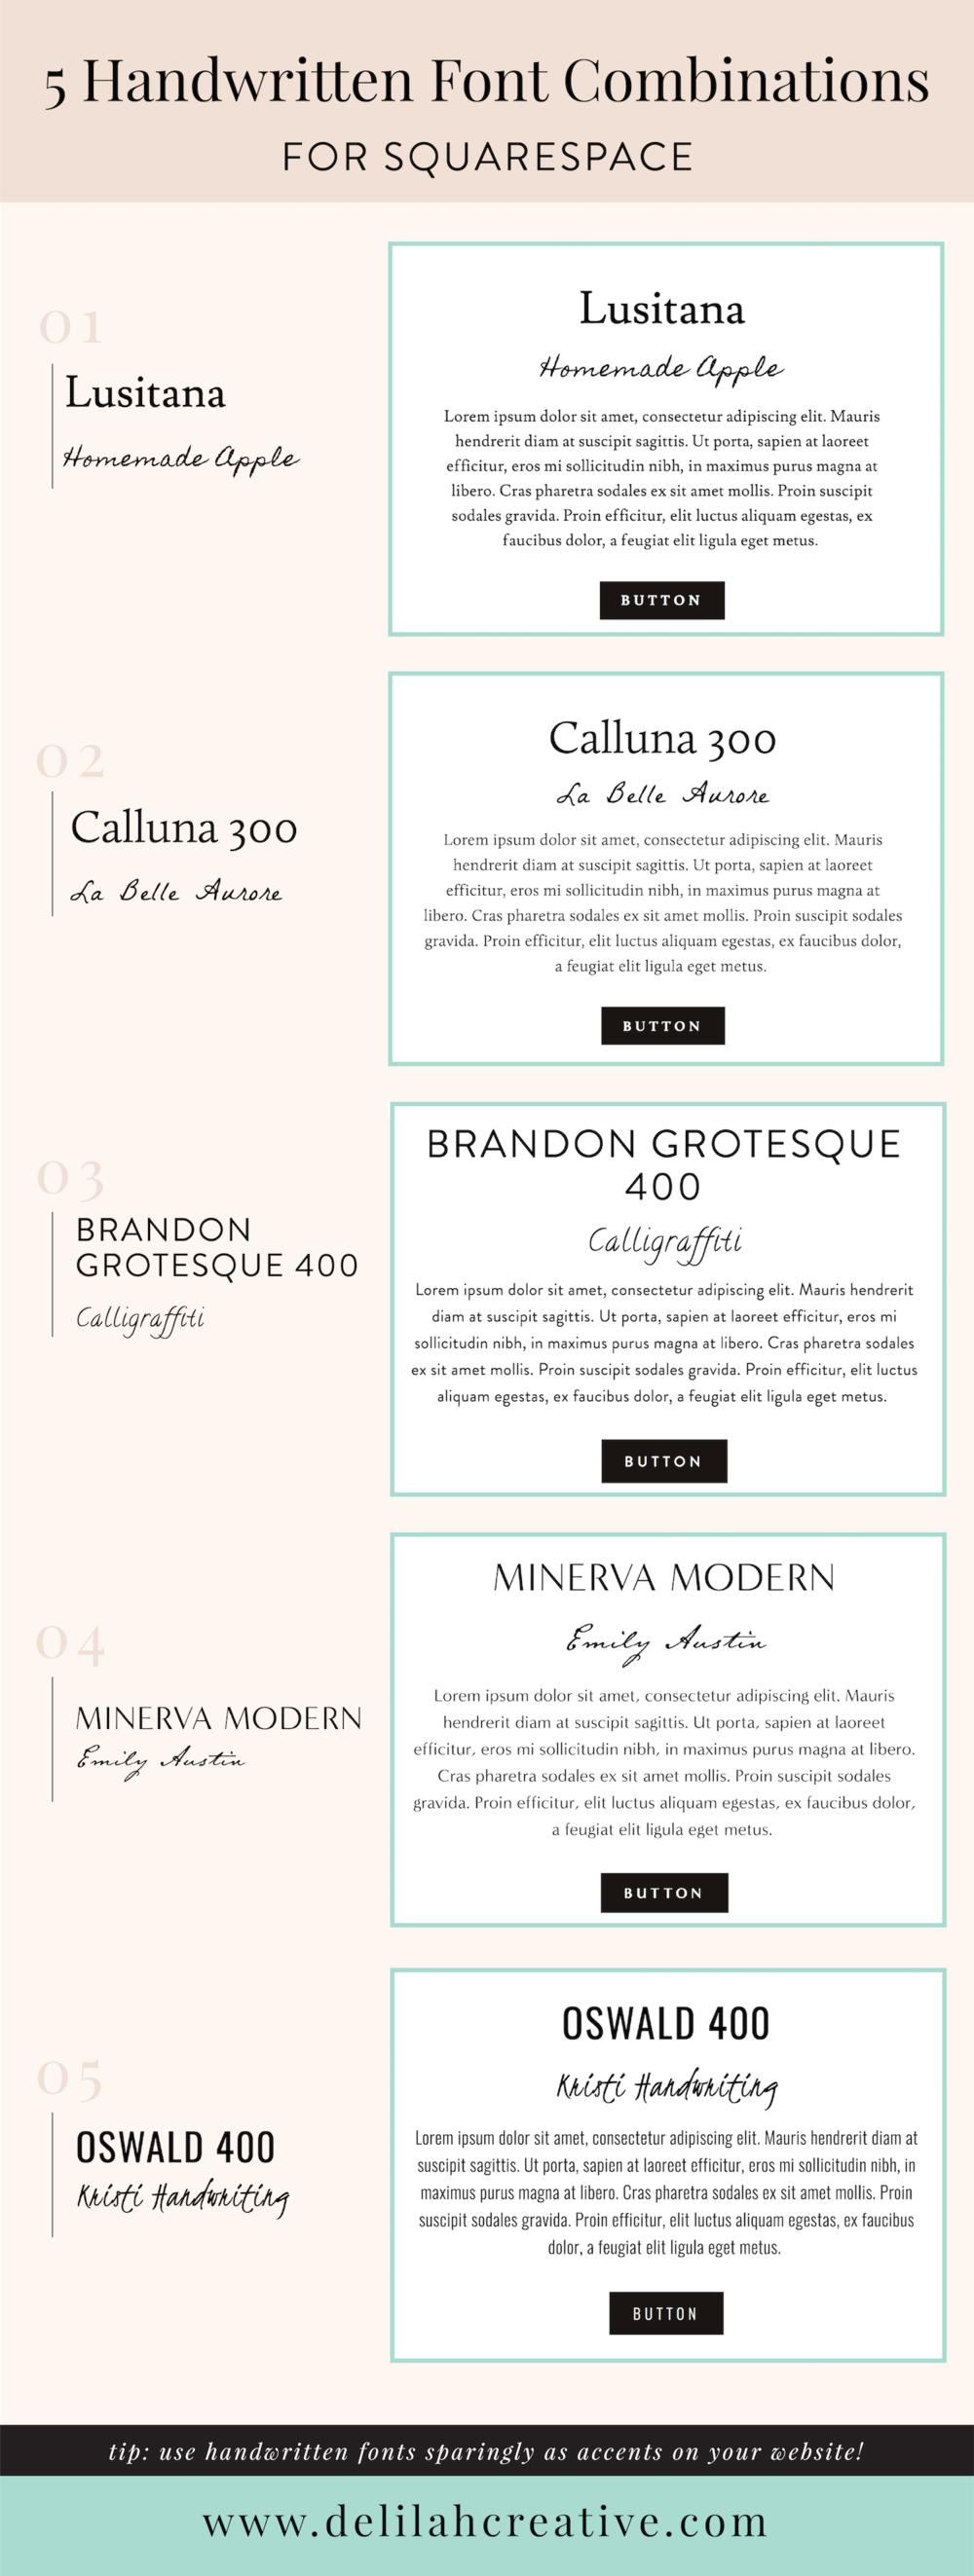 HandwrittenFont Combinations.png